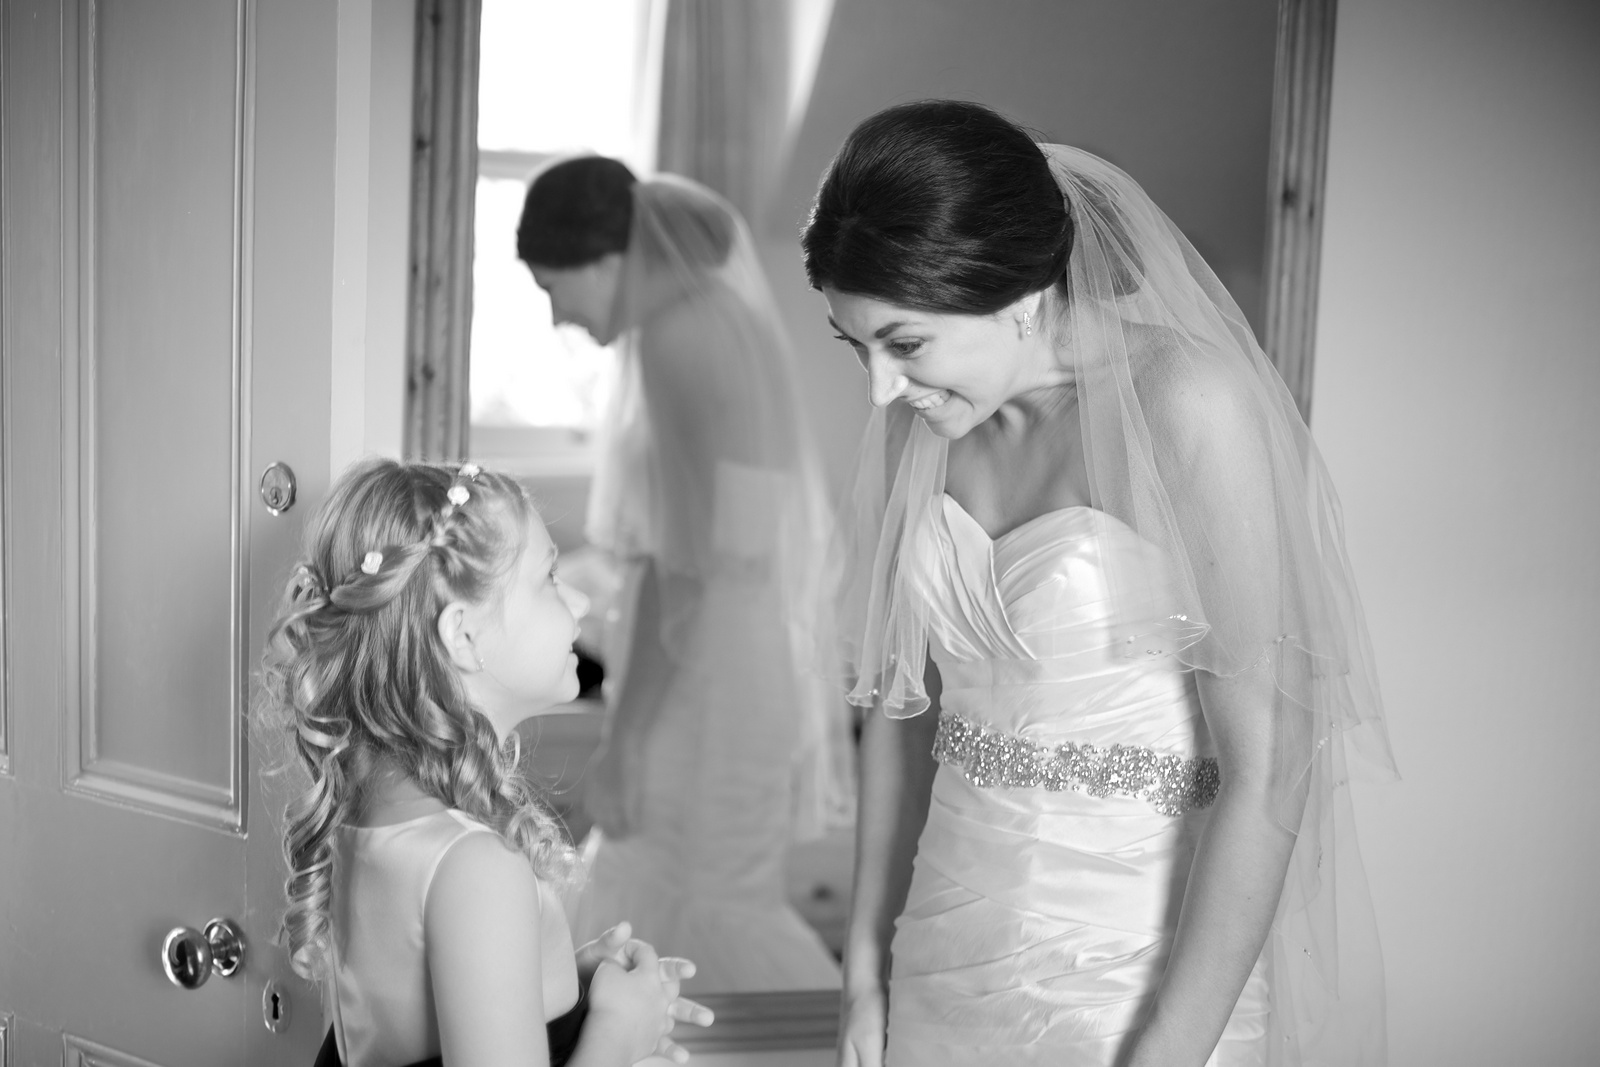 02_Bride & Daughter.jpg